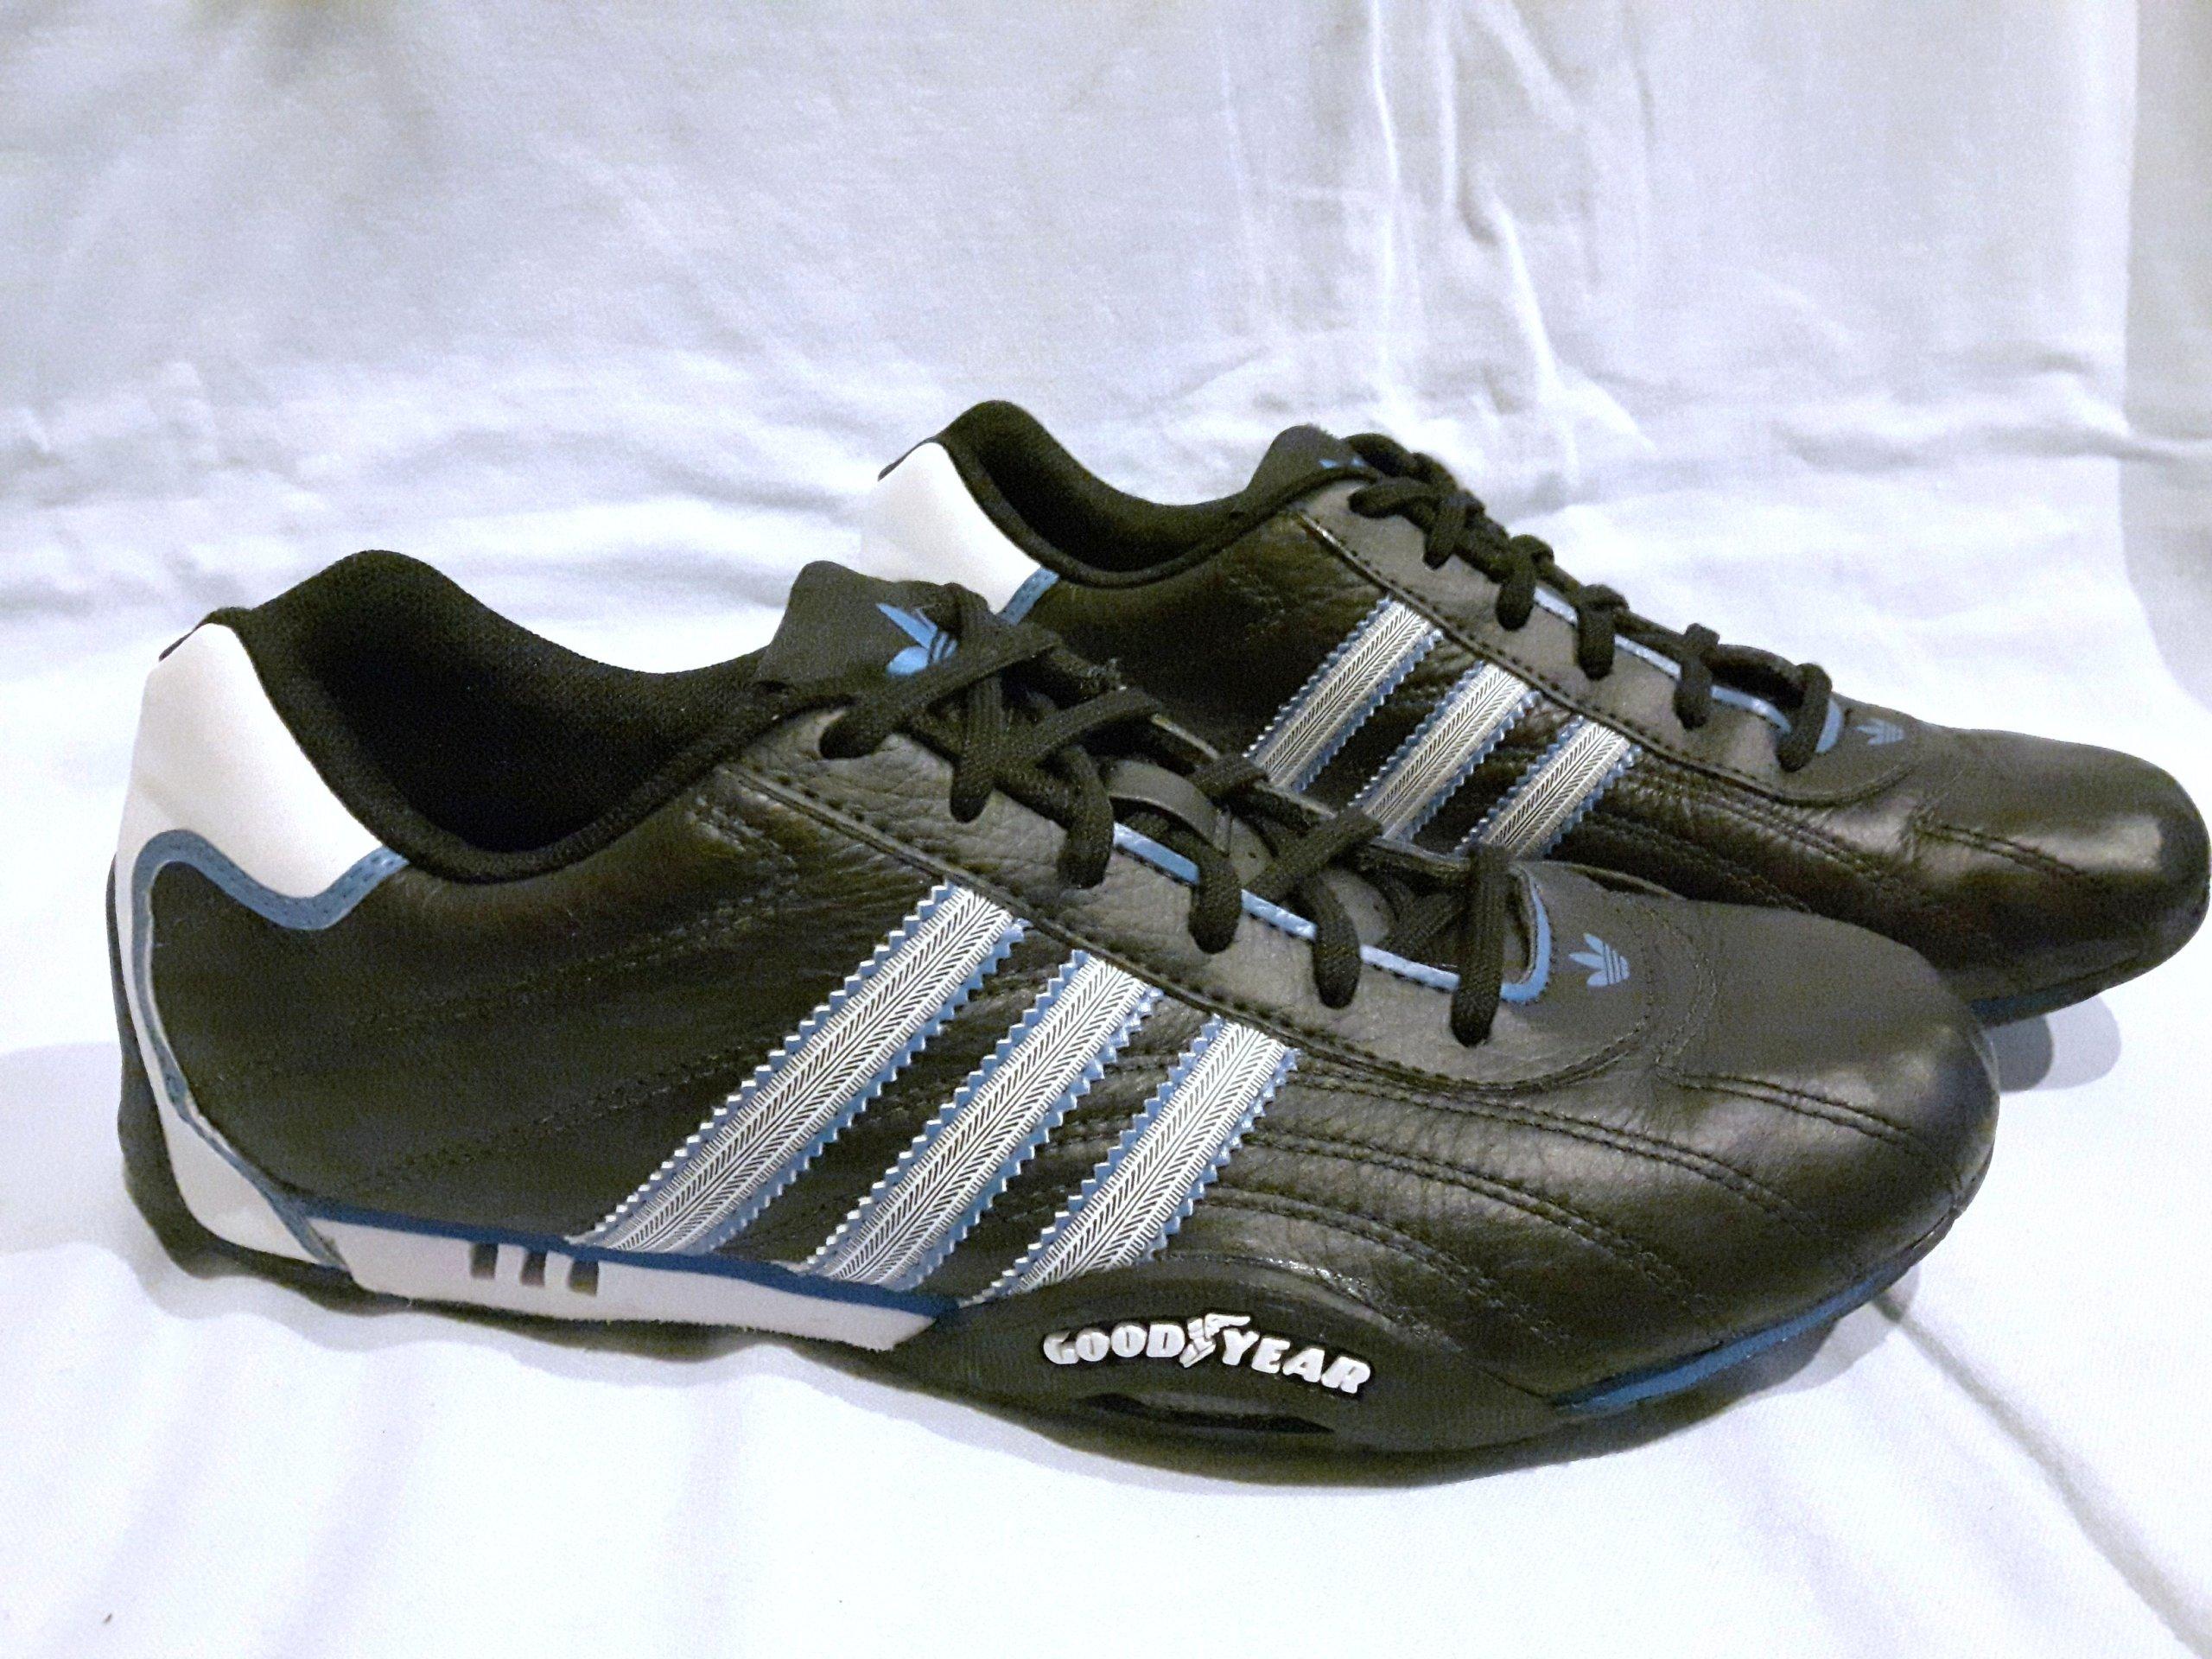 Buty skórzane ADIDAS GoodYear roz.38 23,wkł.24cm